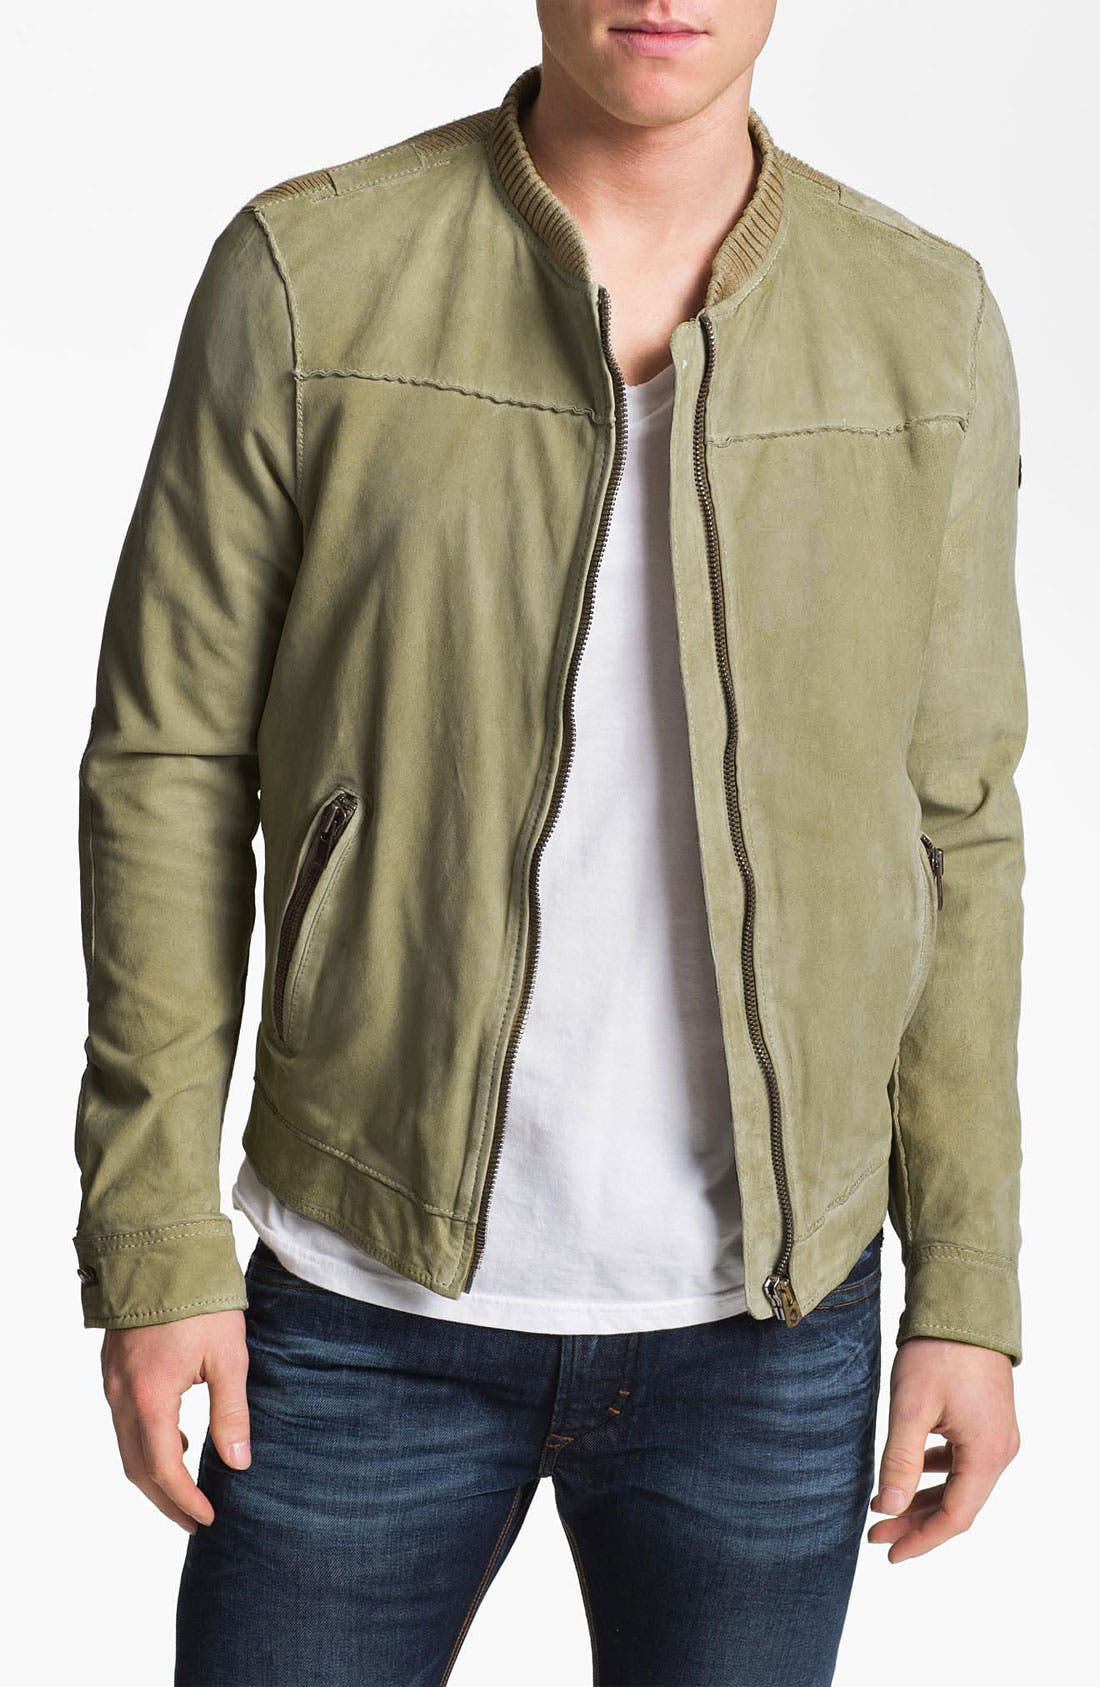 Alternate Image 1 Selected - DIESEL® 'Lisko' Lamb Leather Knit Jacket